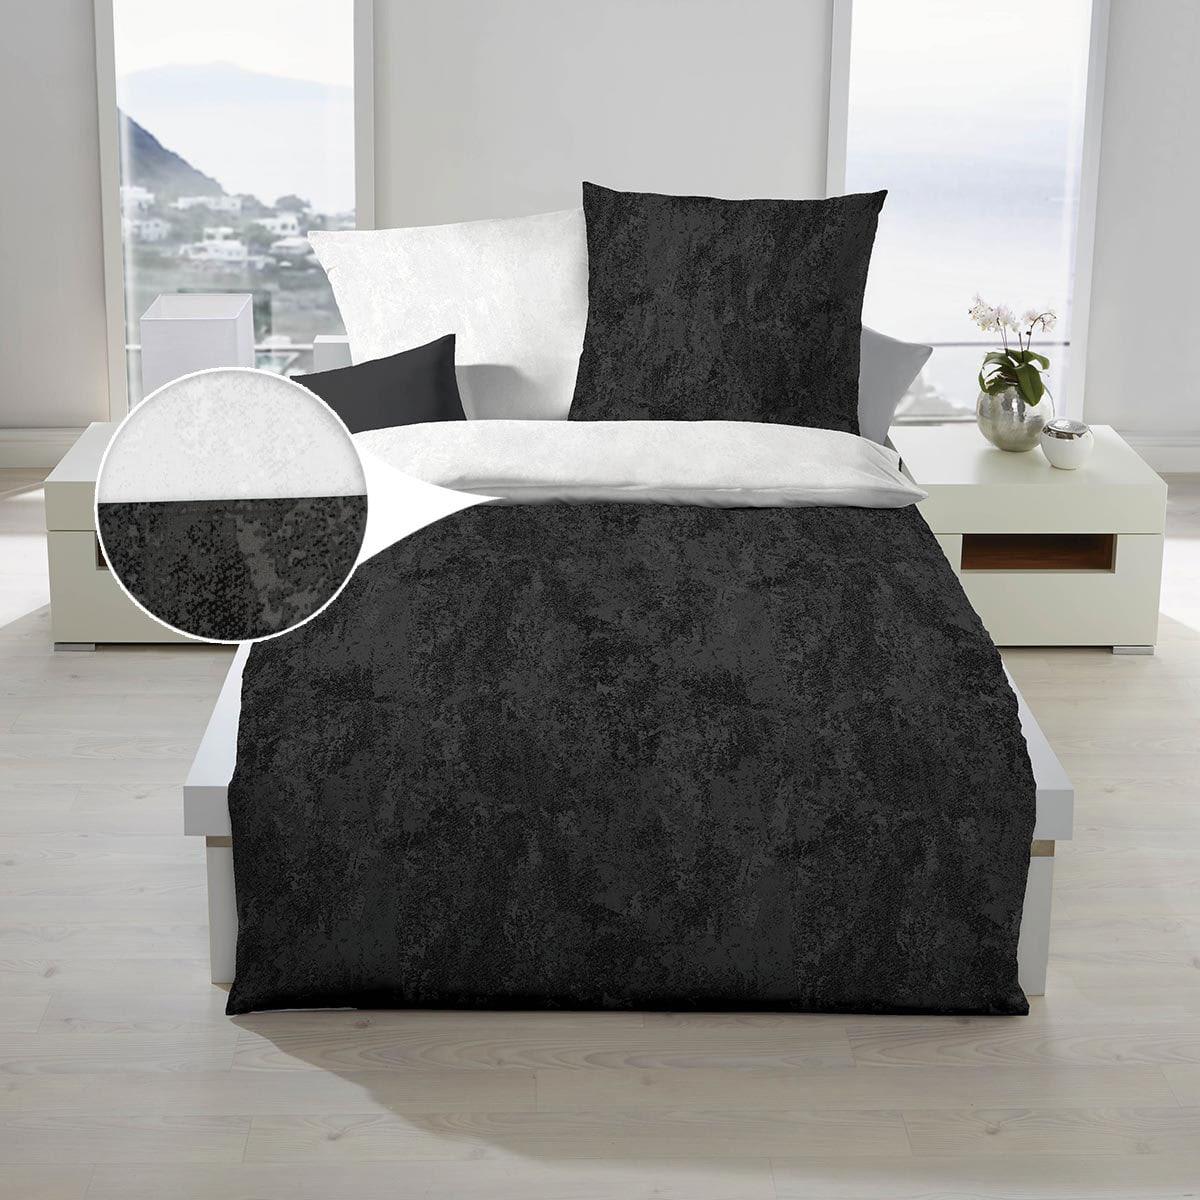 BettwarenShop Mako-Satin Bettwäsche Texture schwarz